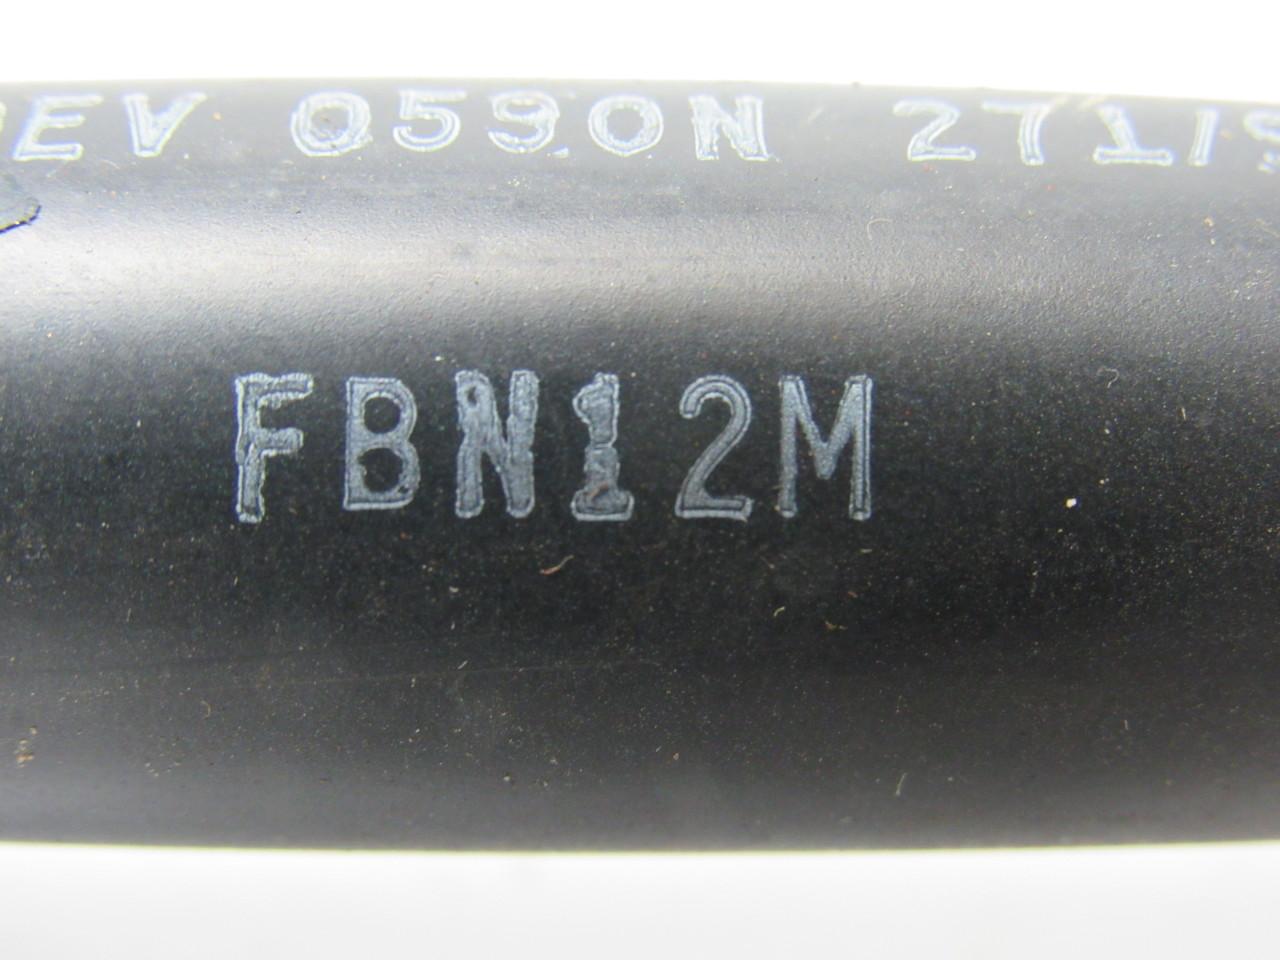 Stabilus Fbn12m Lift O Mat Ball End Gas Spring 6 65